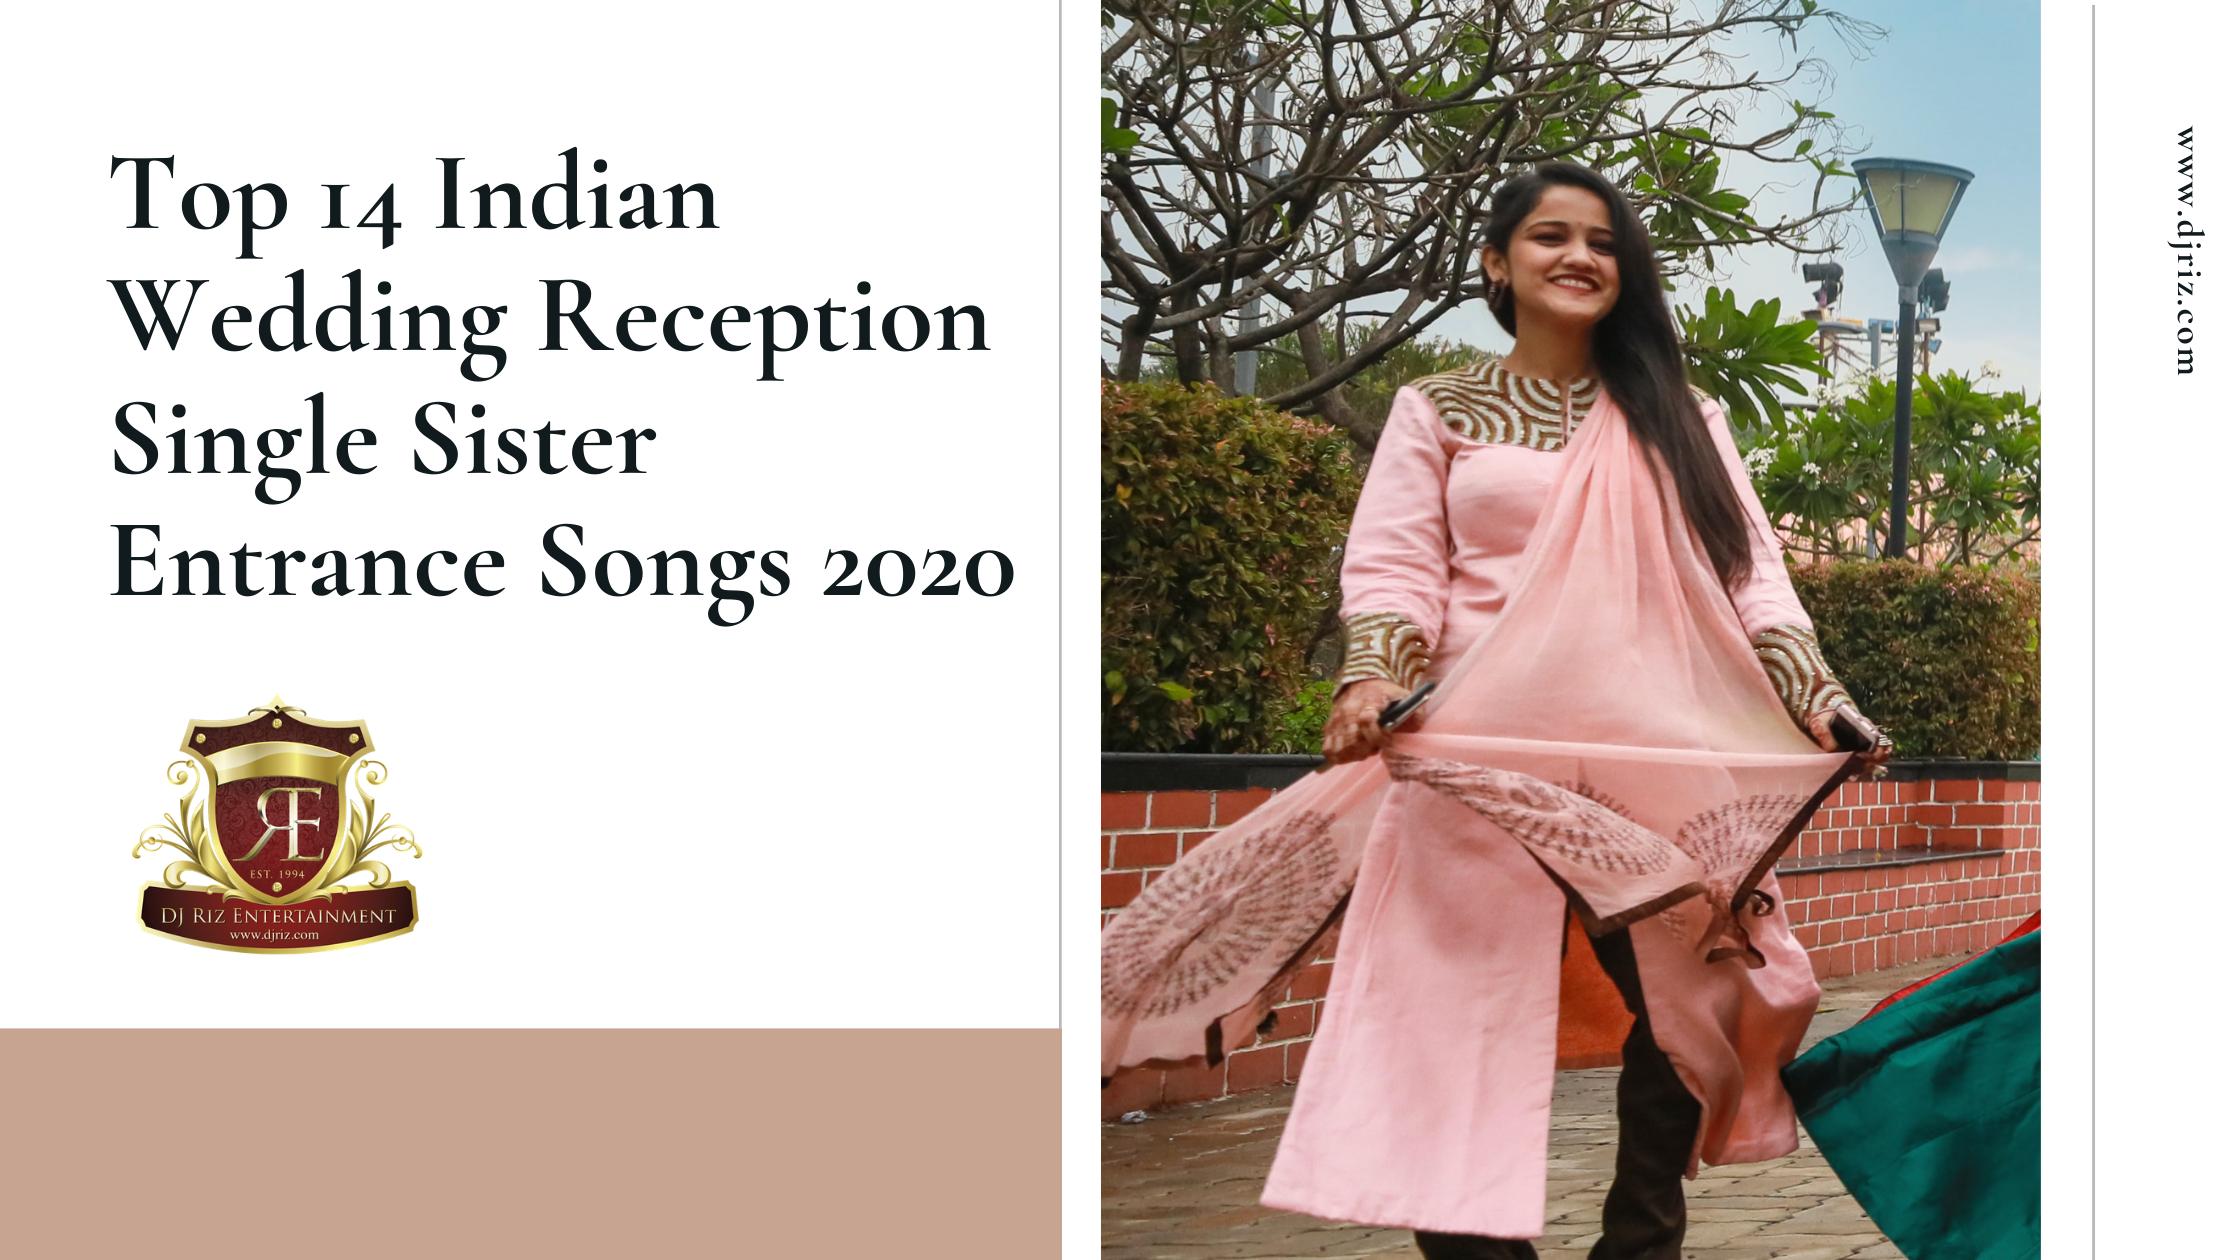 Top 14 Indian Wedding Reception Single Sister Entrance Songs 2020